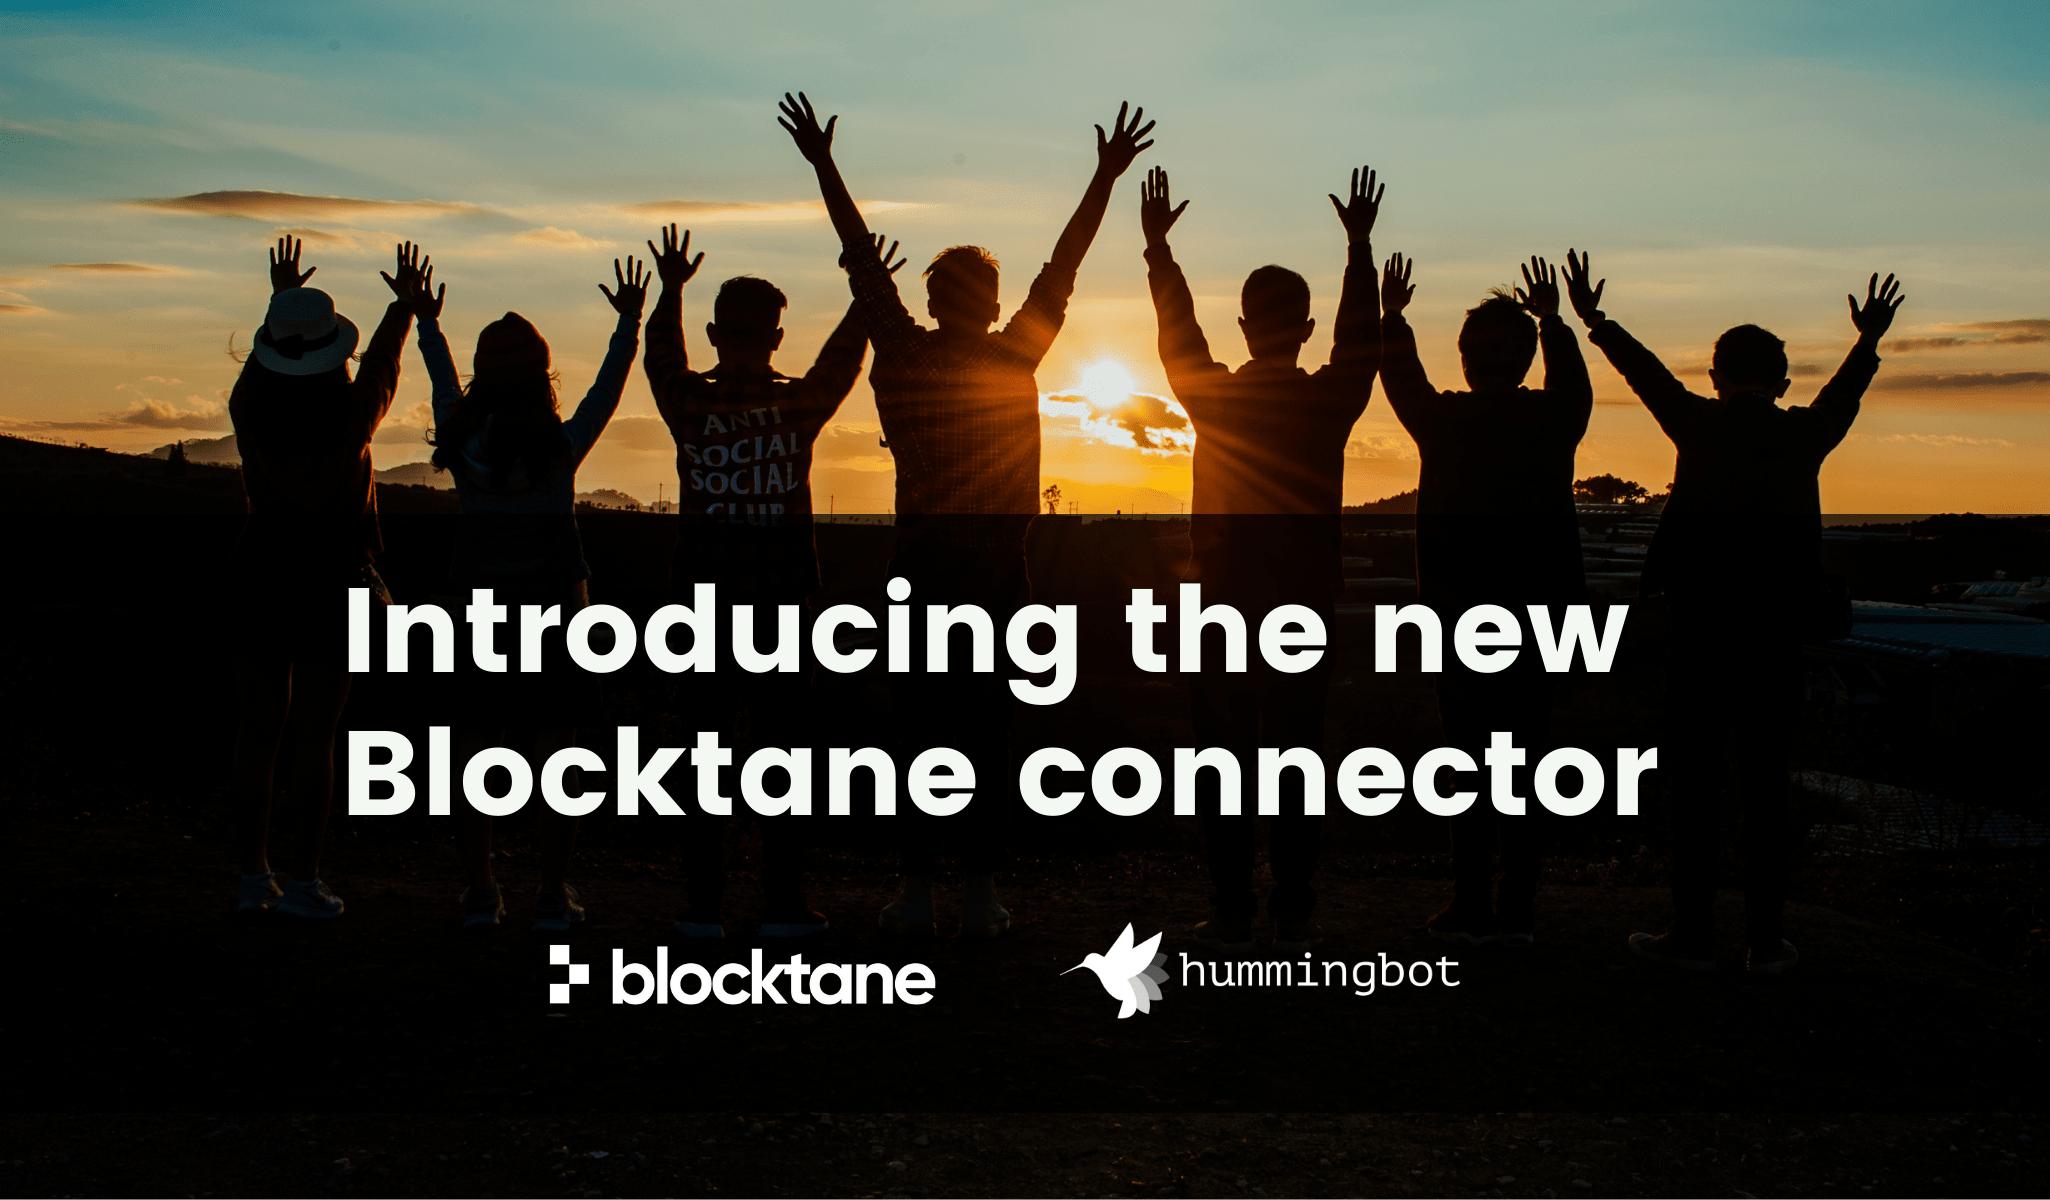 Hummingbot partners with Blocktane.io